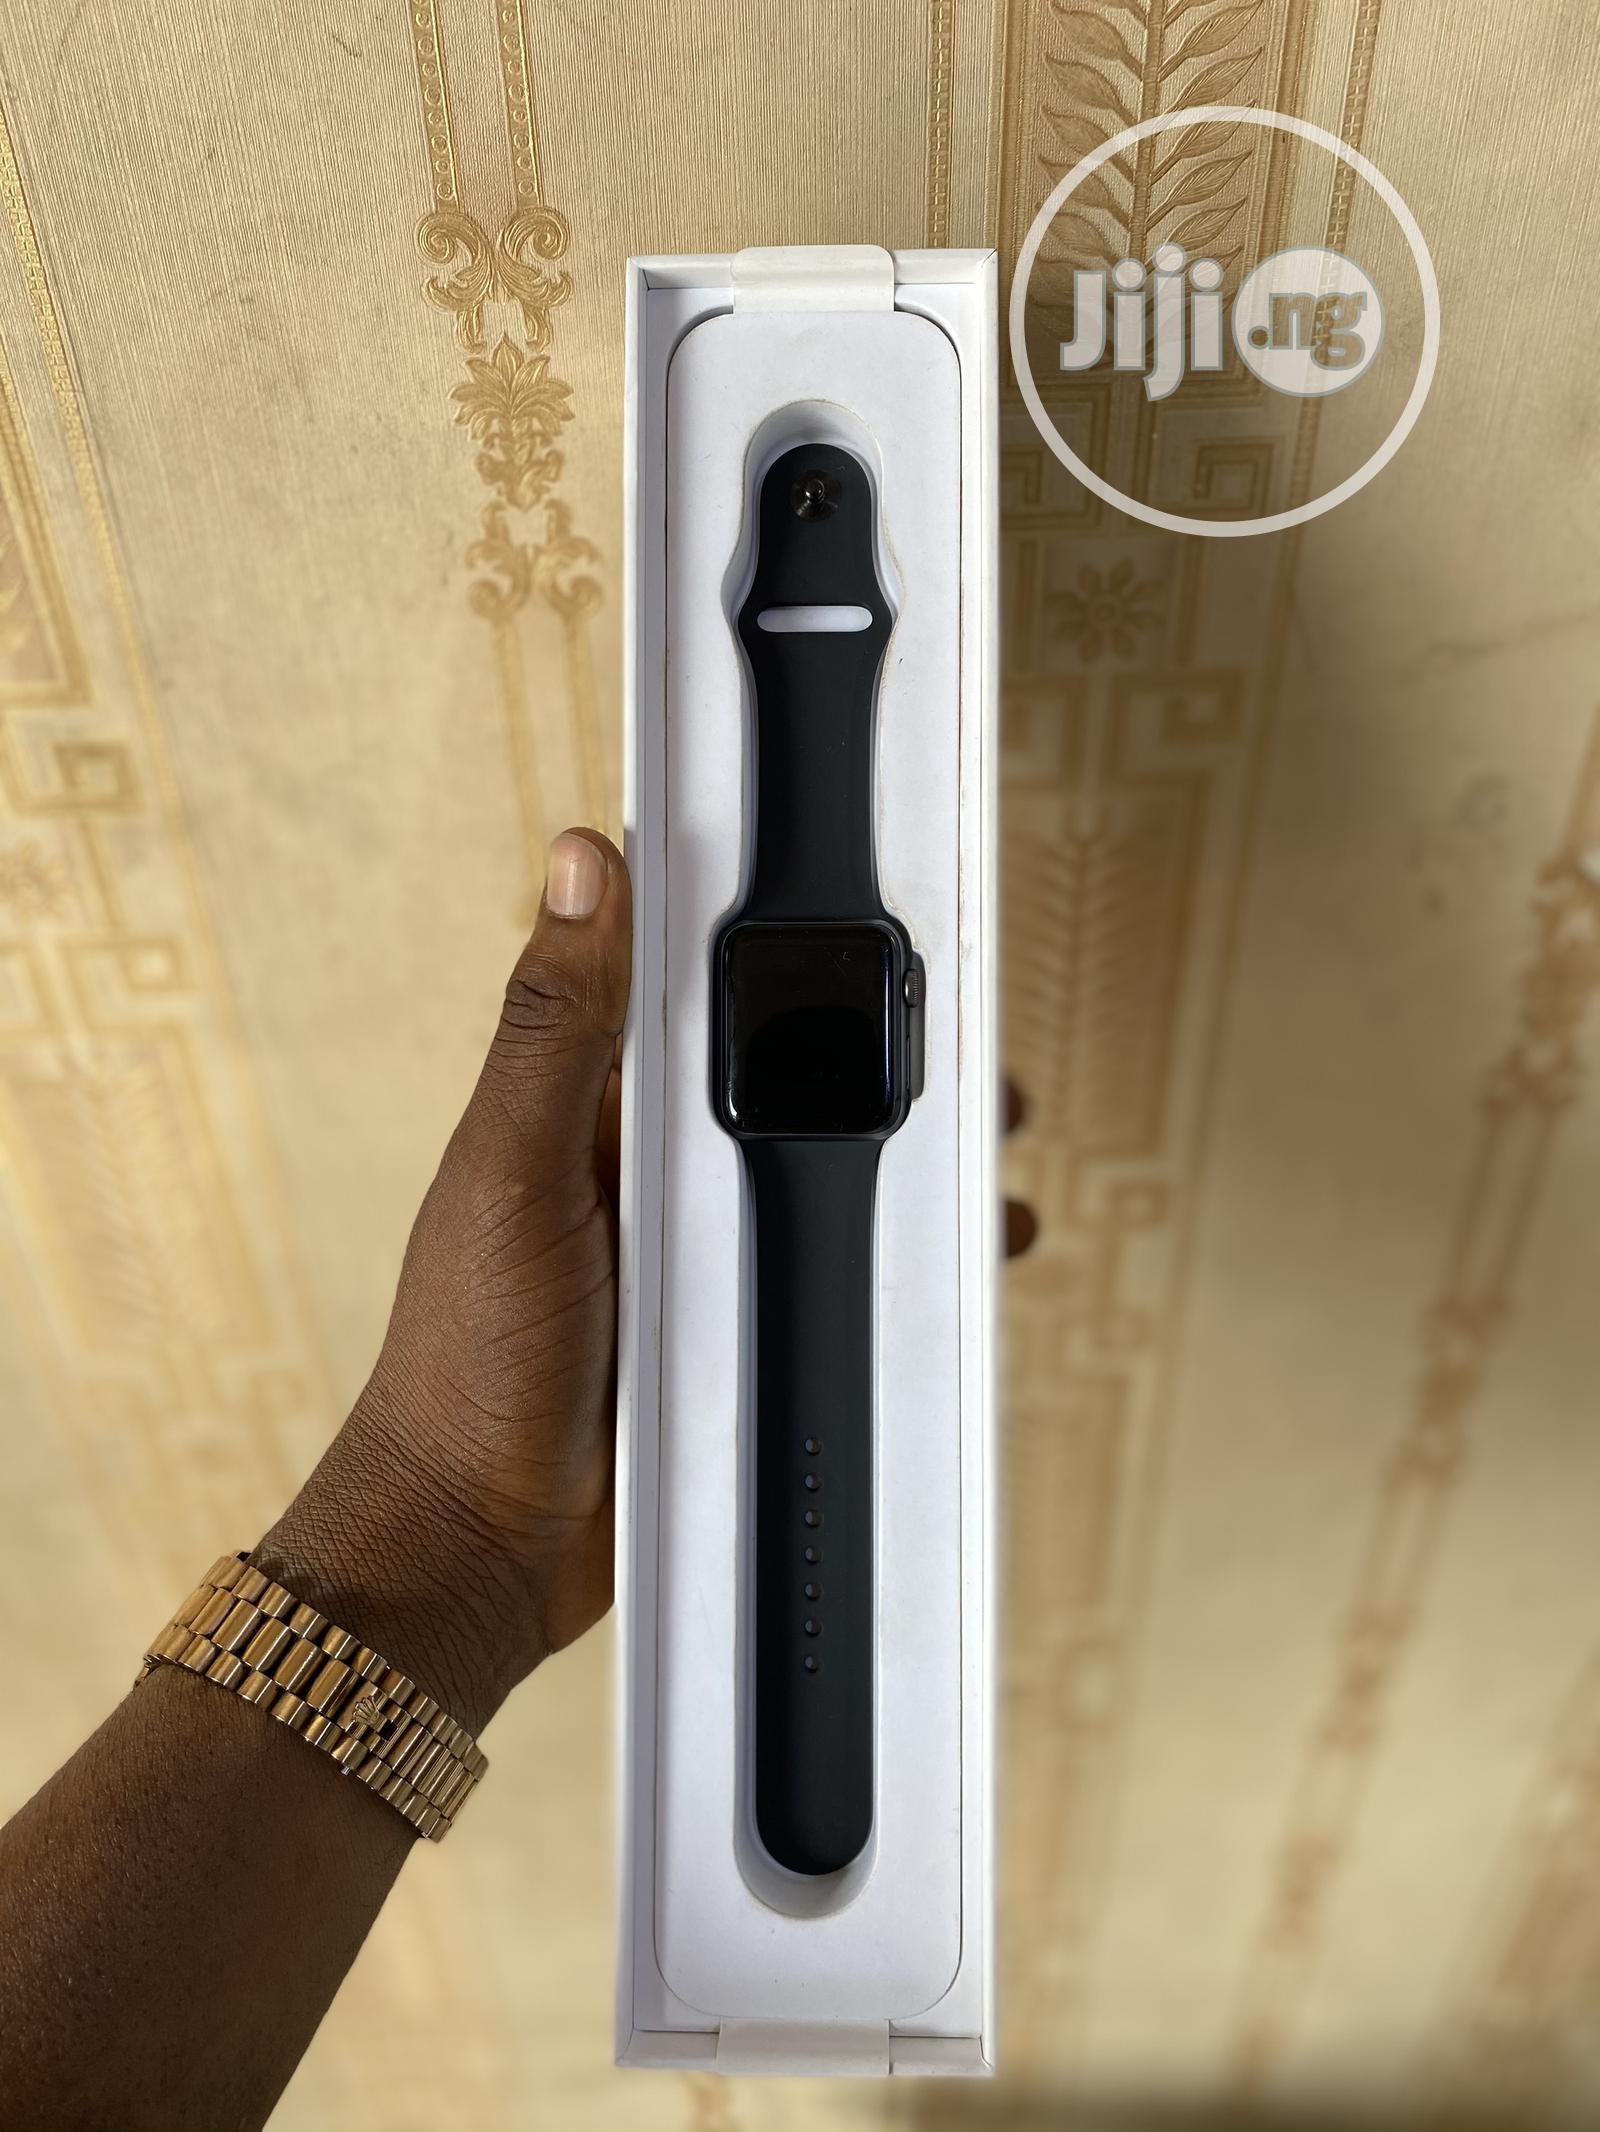 Apple Iwatch Series 3 42mm Gps+Cellular